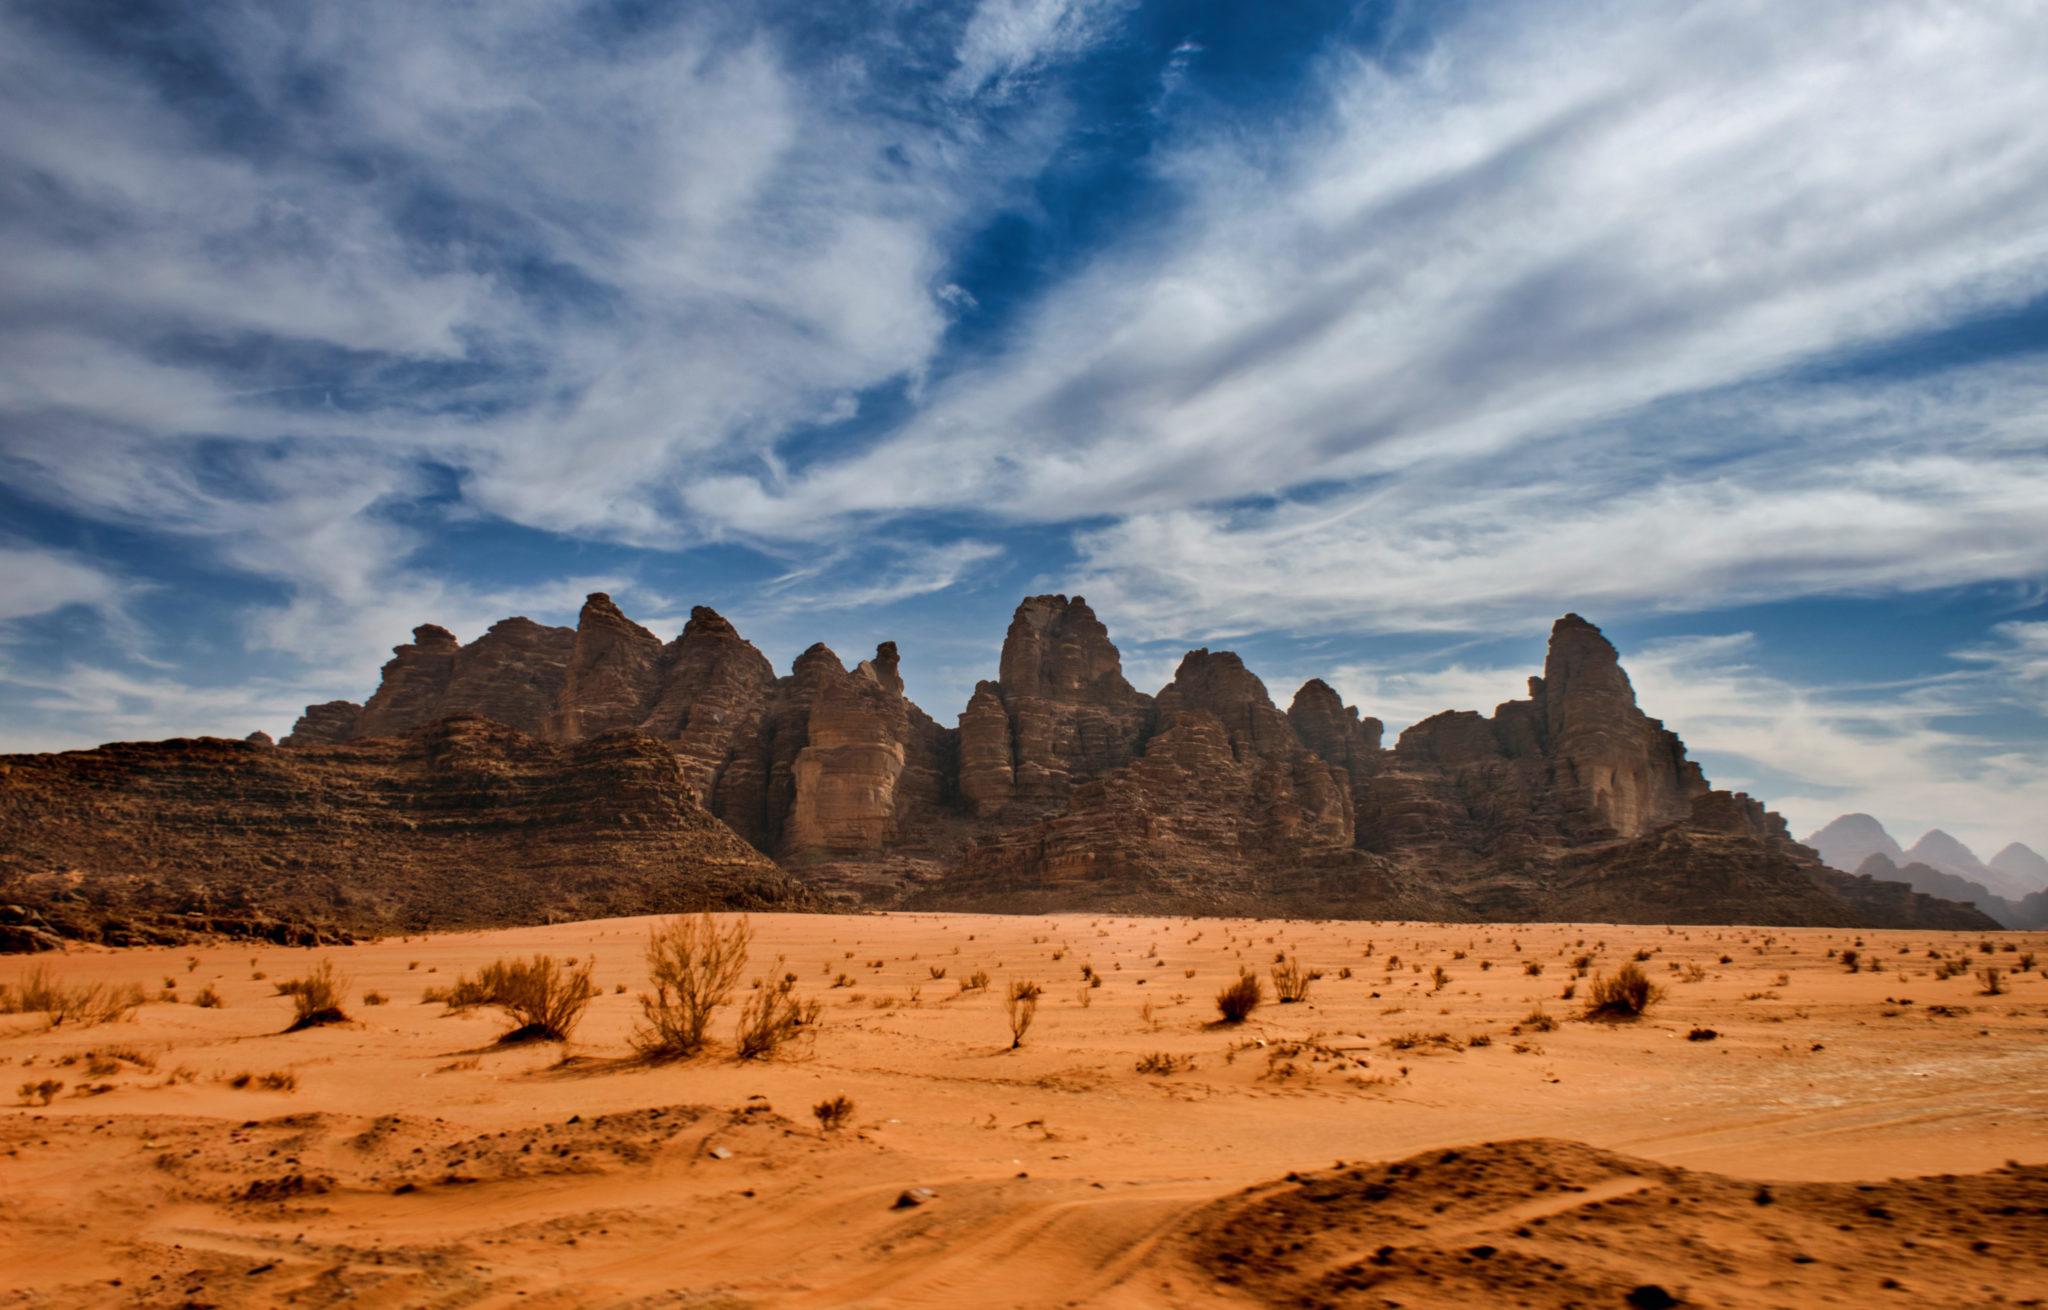 Montagne nel deserto del Wadi Rum